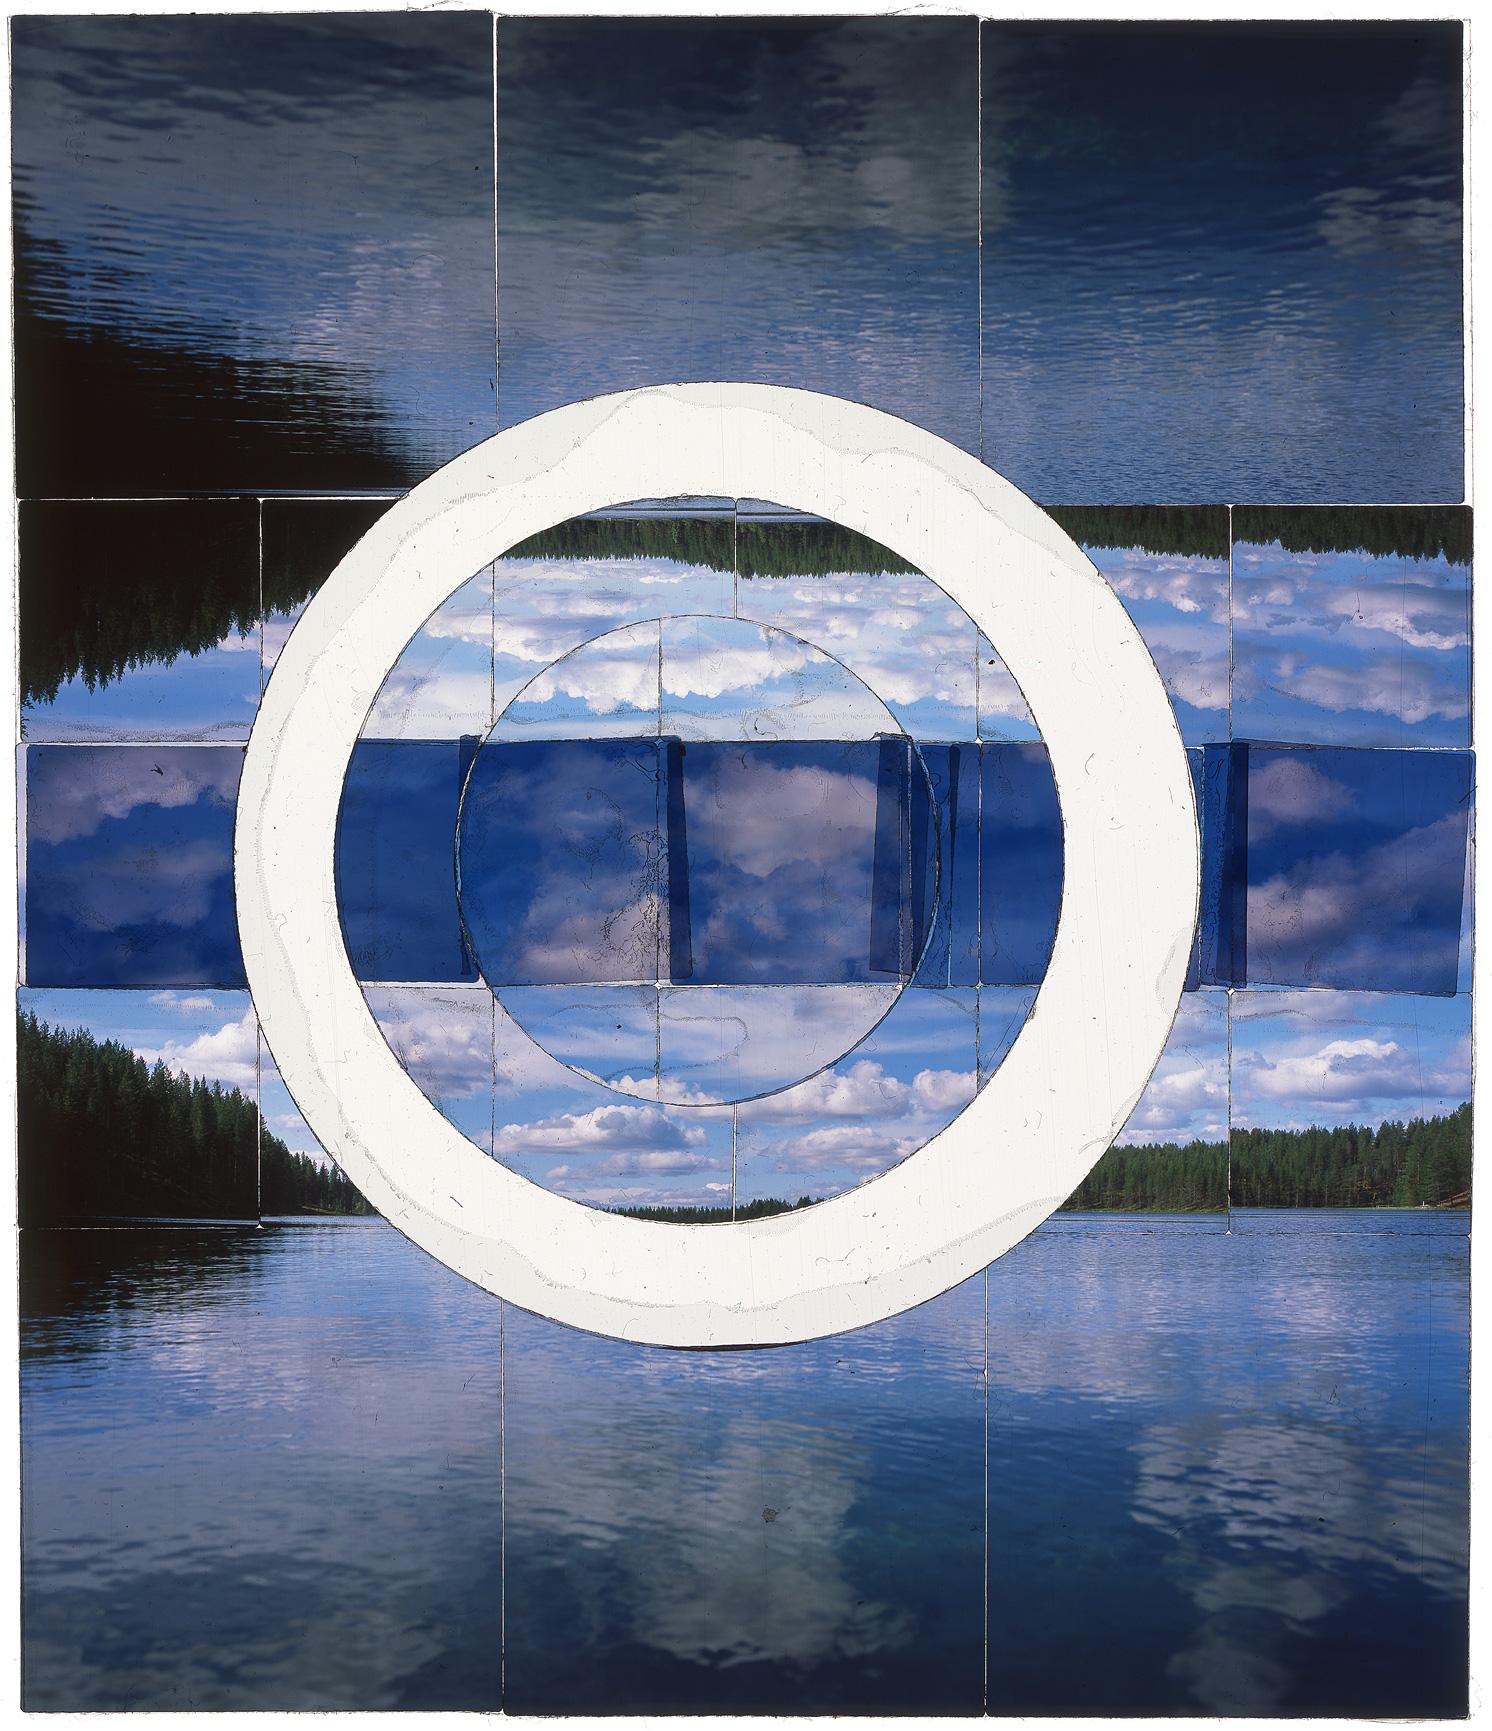 "ÖLLÖRI, FINLAND - 30""x36"" (76cmx91cm) • TRANSPARENCY FILM PRINT, ARCHIVAL PIGMENT ON FUJI LUSTRE  (EDITION OF 5)"